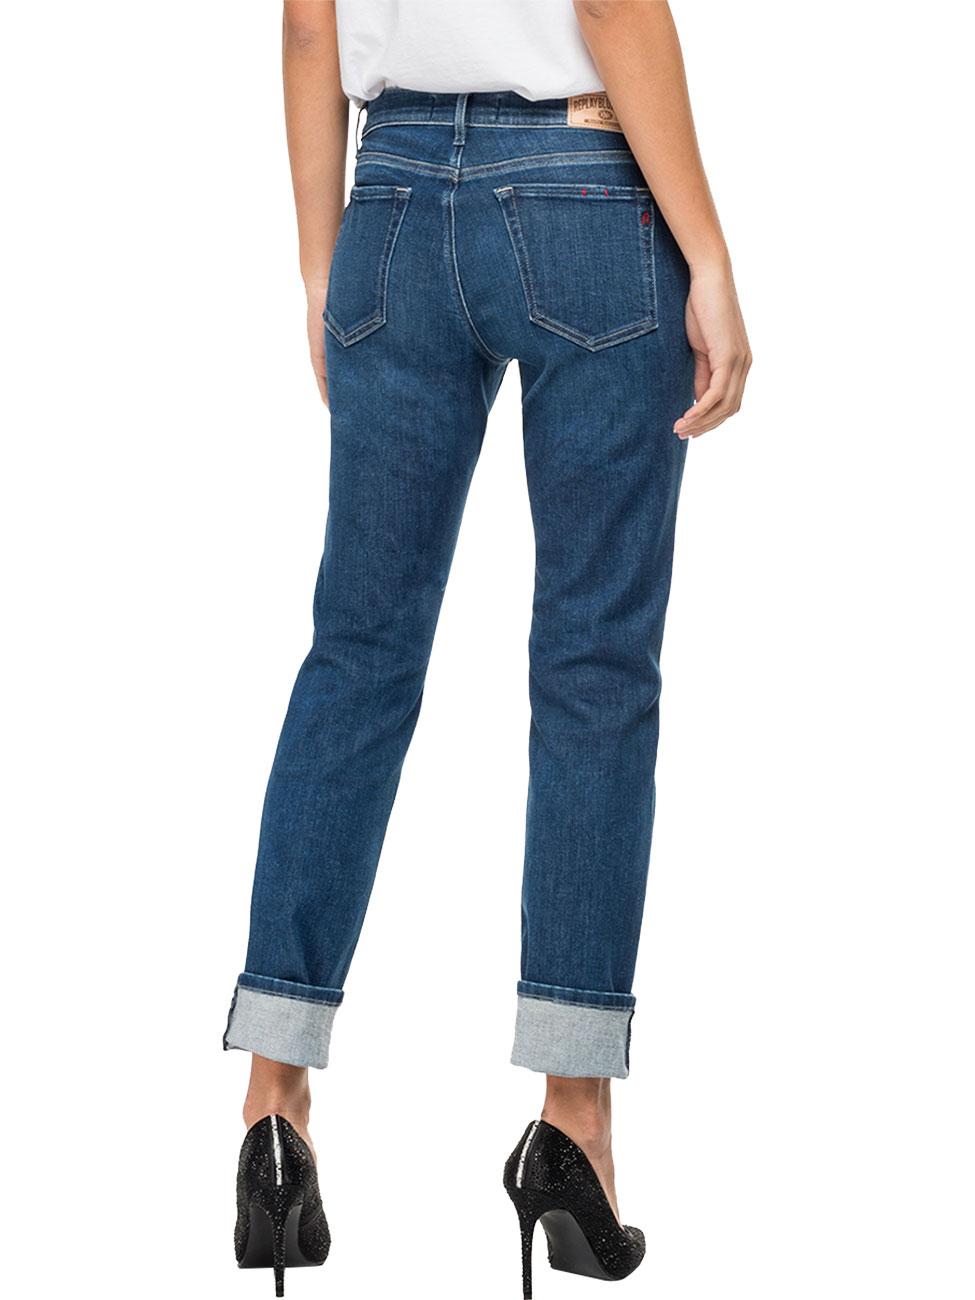 replay-damen-jeans-vivy-slim-fit-blau-dark-blue-denim, 122.55 EUR @ jeans